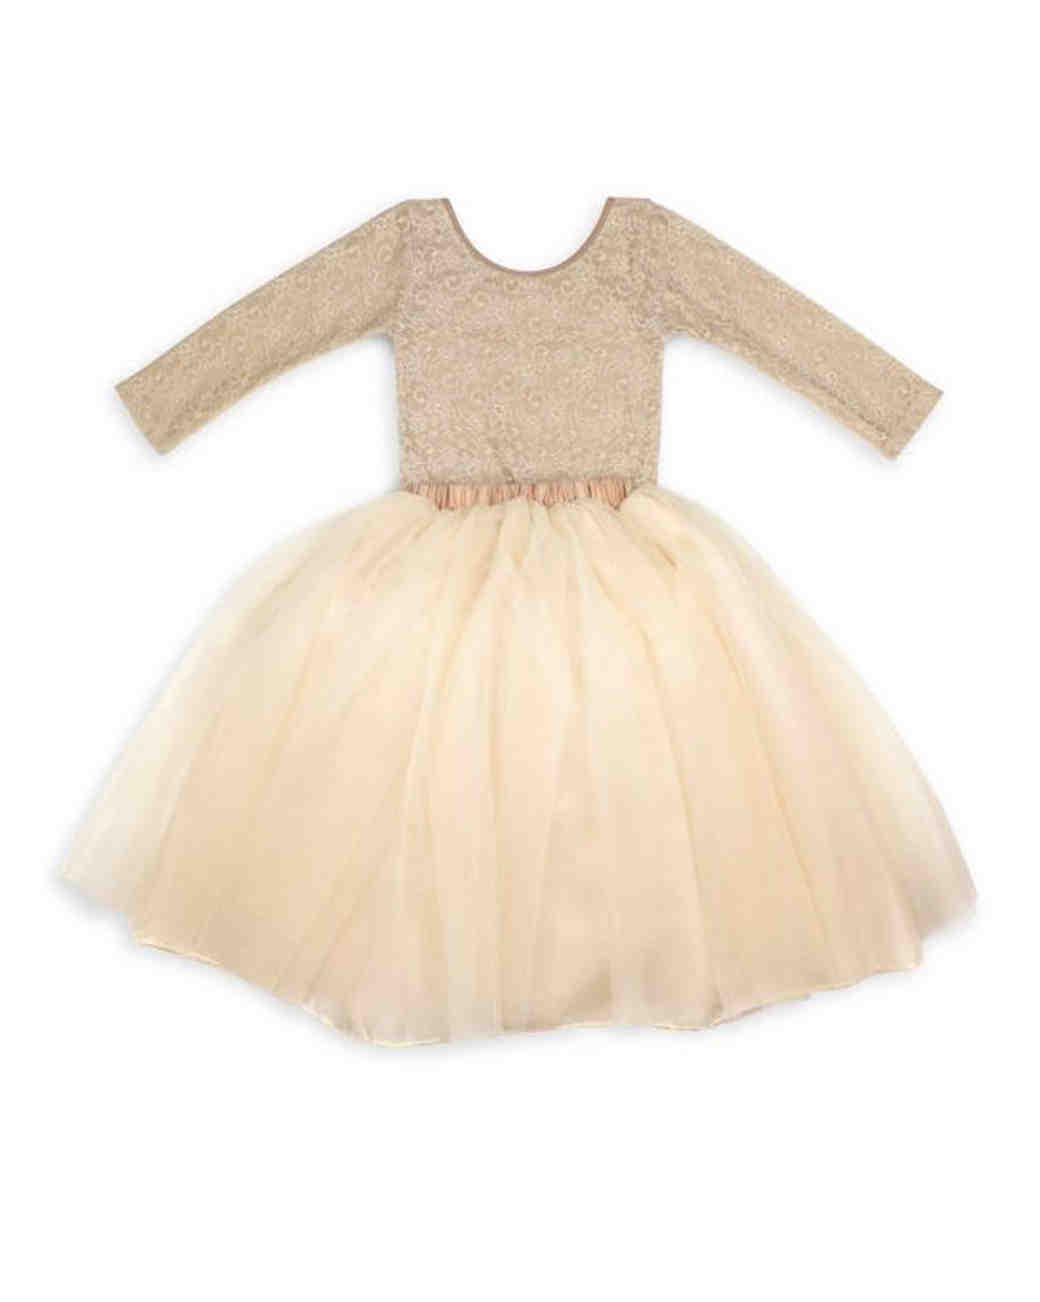 8b0498faed4 The Sweetest Long-Sleeve Dresses for Flower Girls